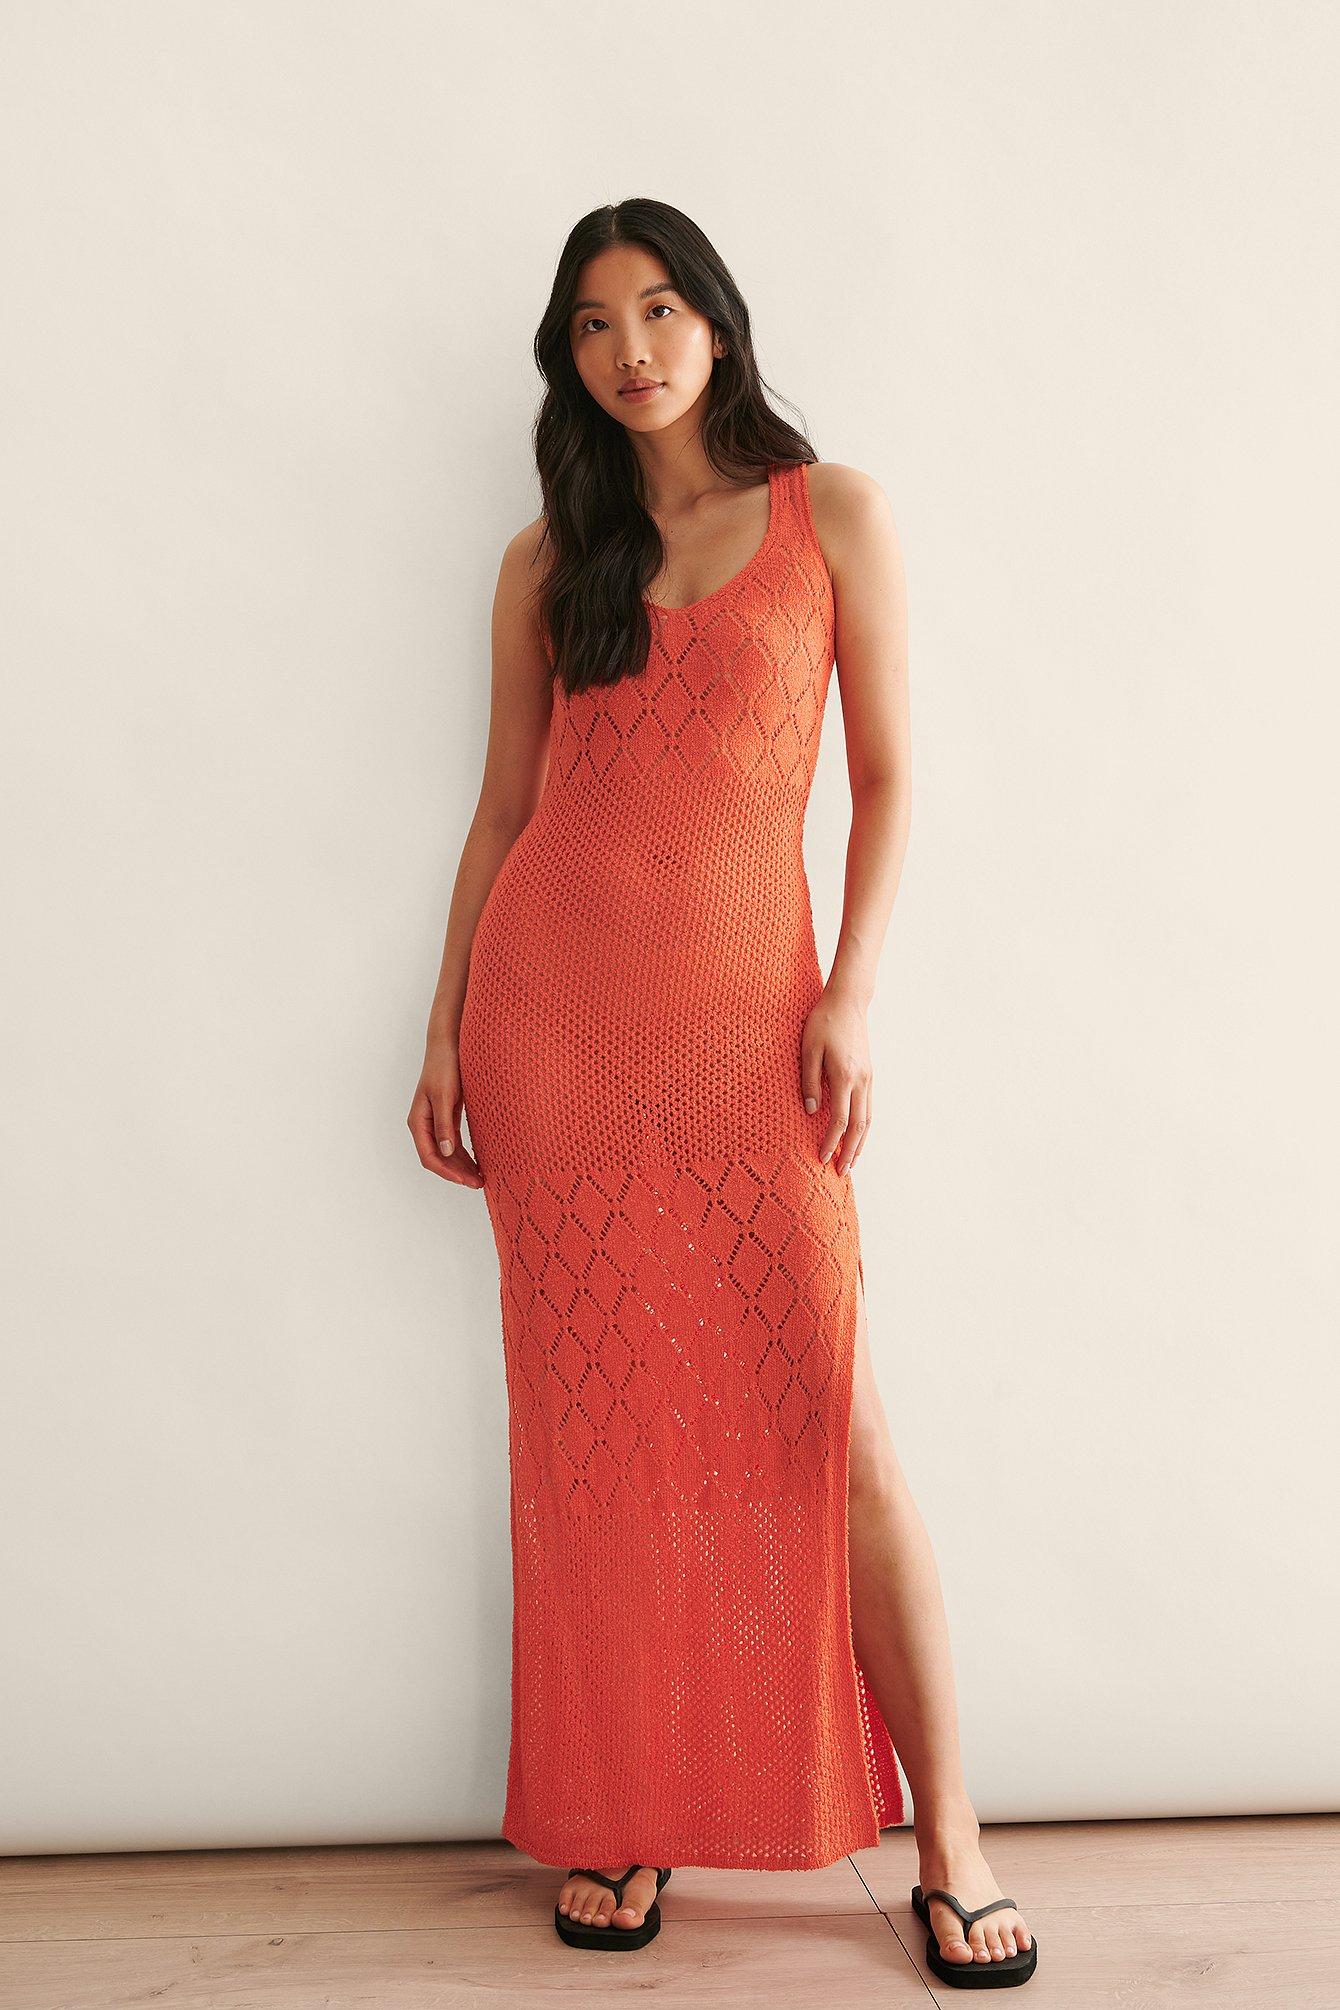 Crochet Maxi Dress $71.95